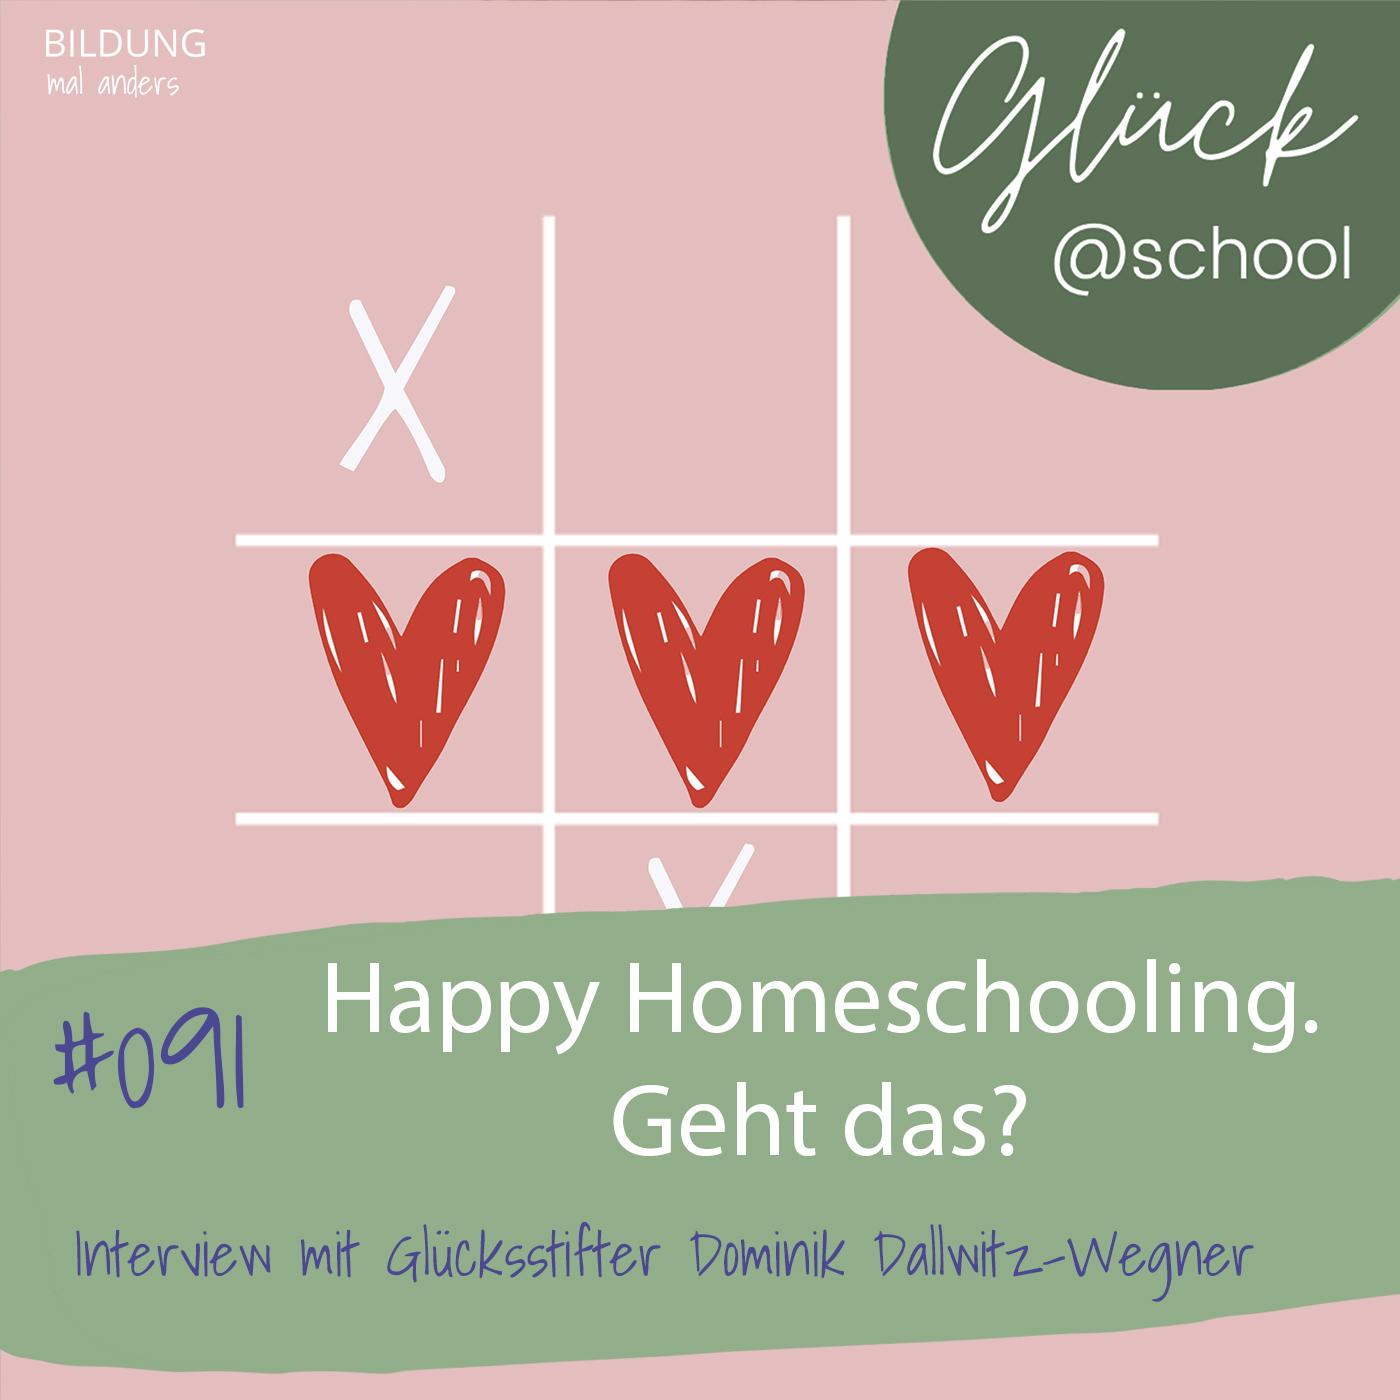 Glück @school mit Mia: Happy Homeschooling. Geht das?